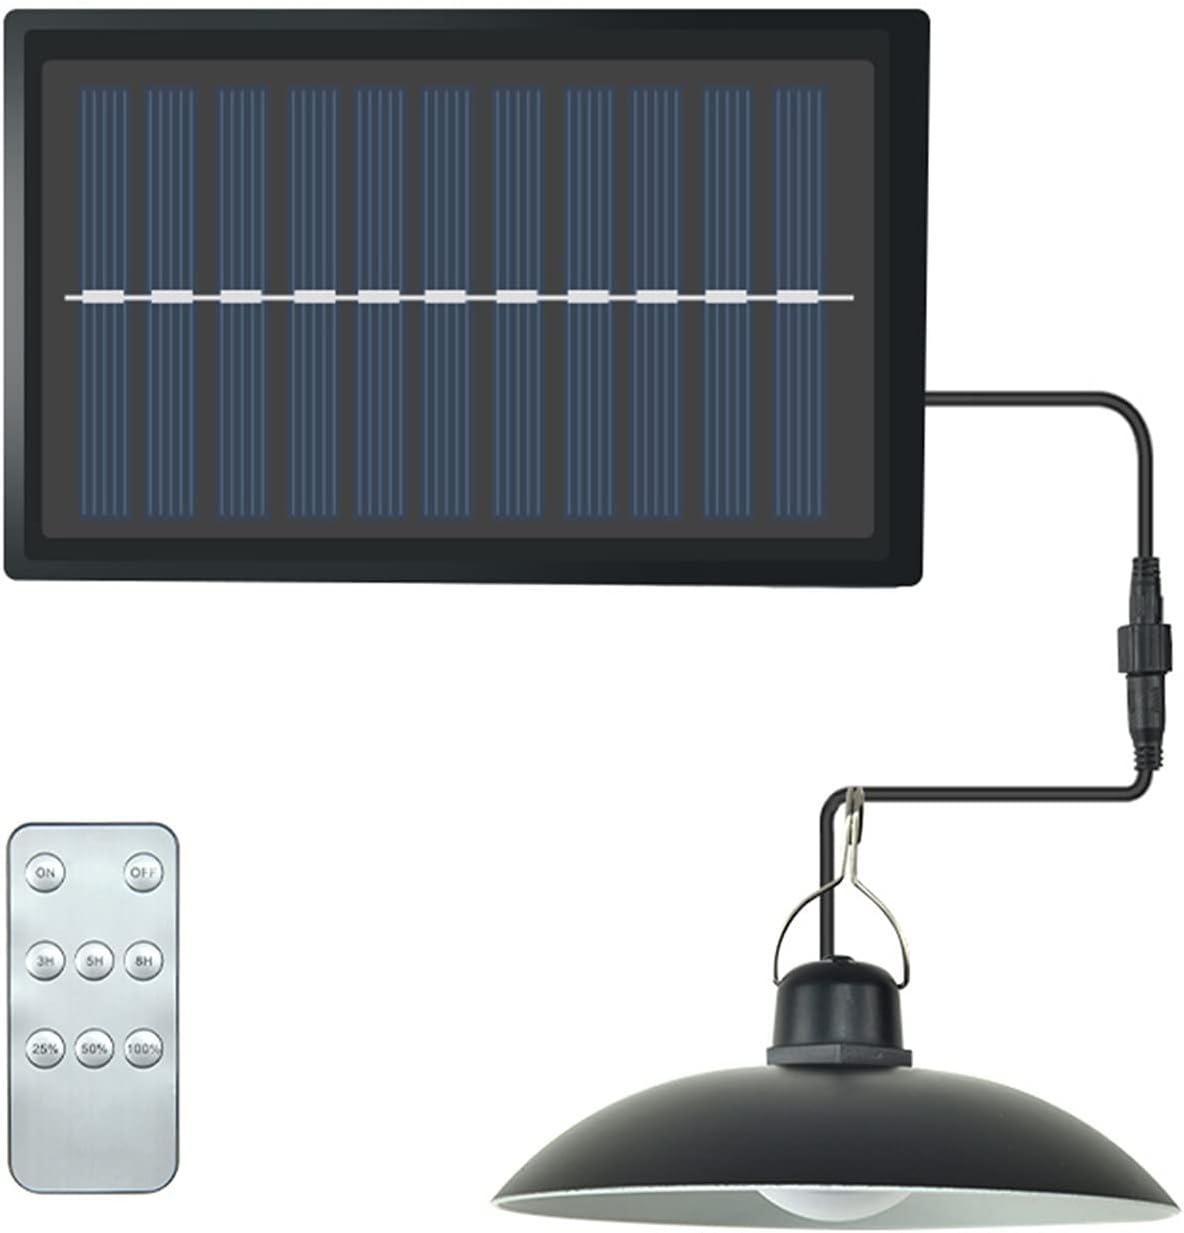 Solar Overseas parallel import regular item Lights Outdoor Cash special price LED Pendant Sola Indoor Light